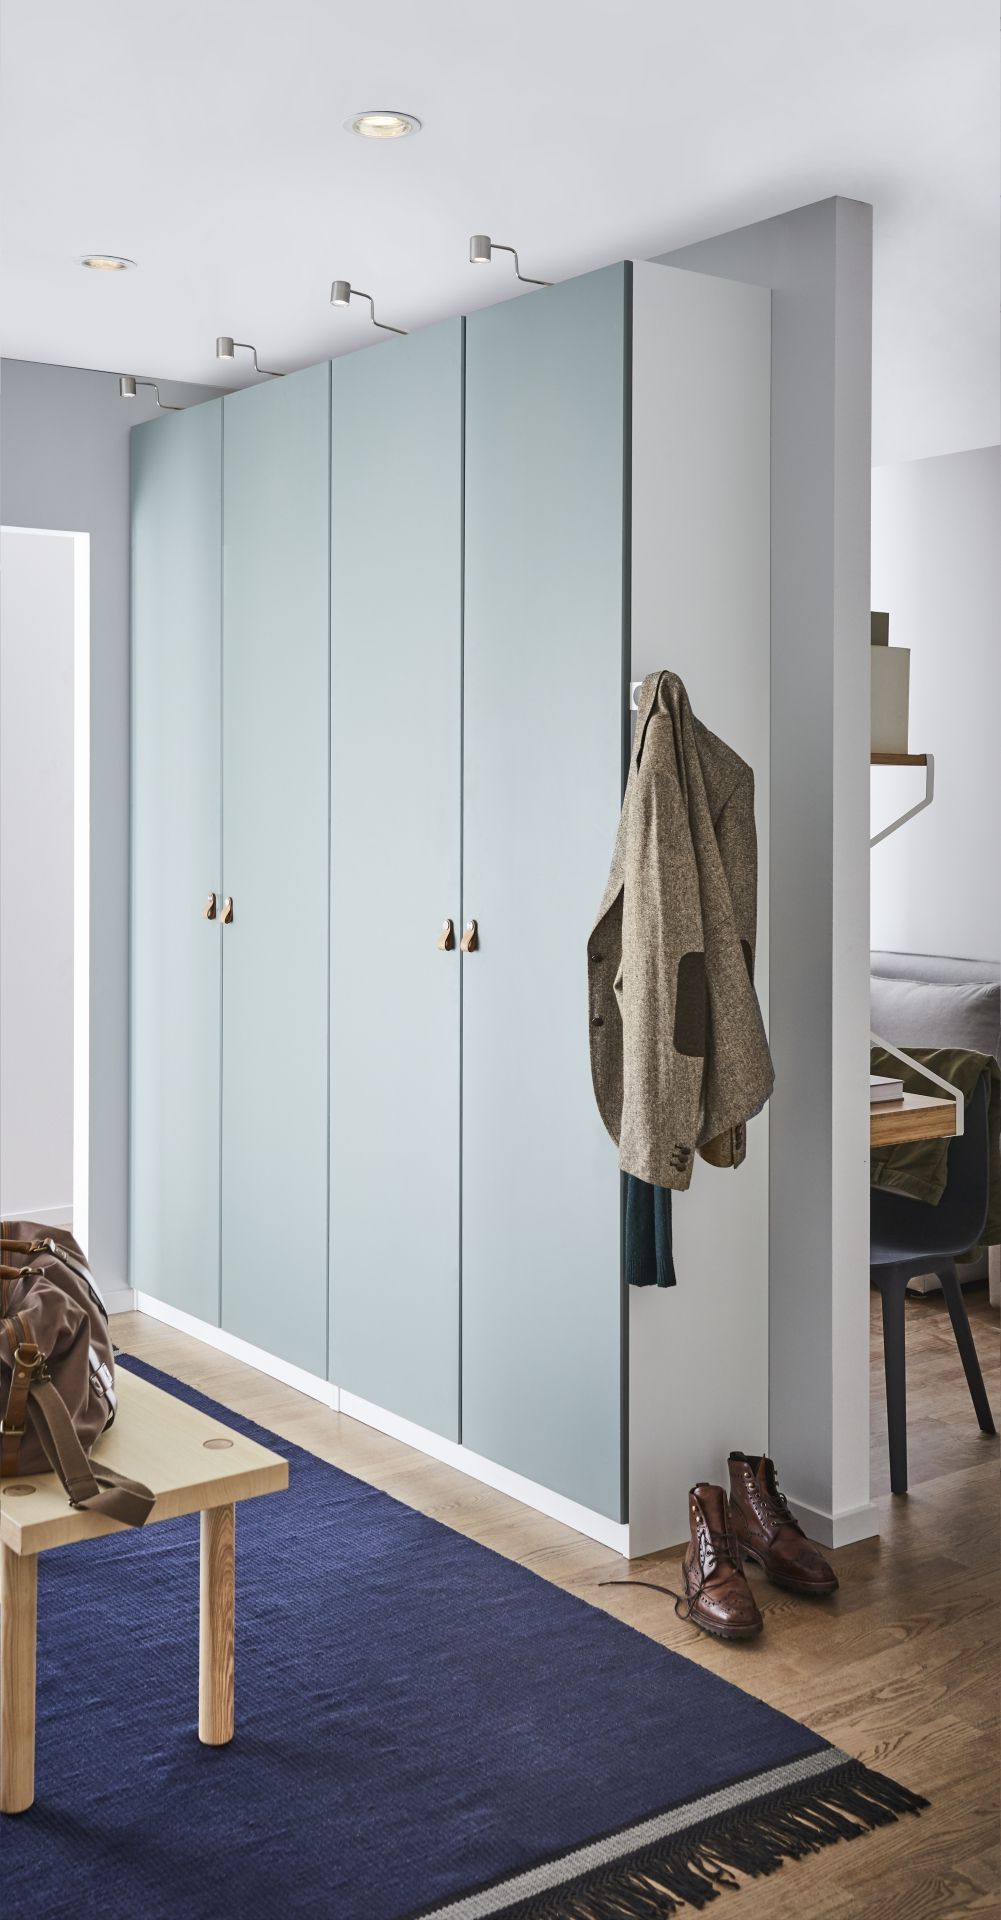 PAX garderobekast | IKEA IKEAnl IKEAnederland kast kledingkast ...